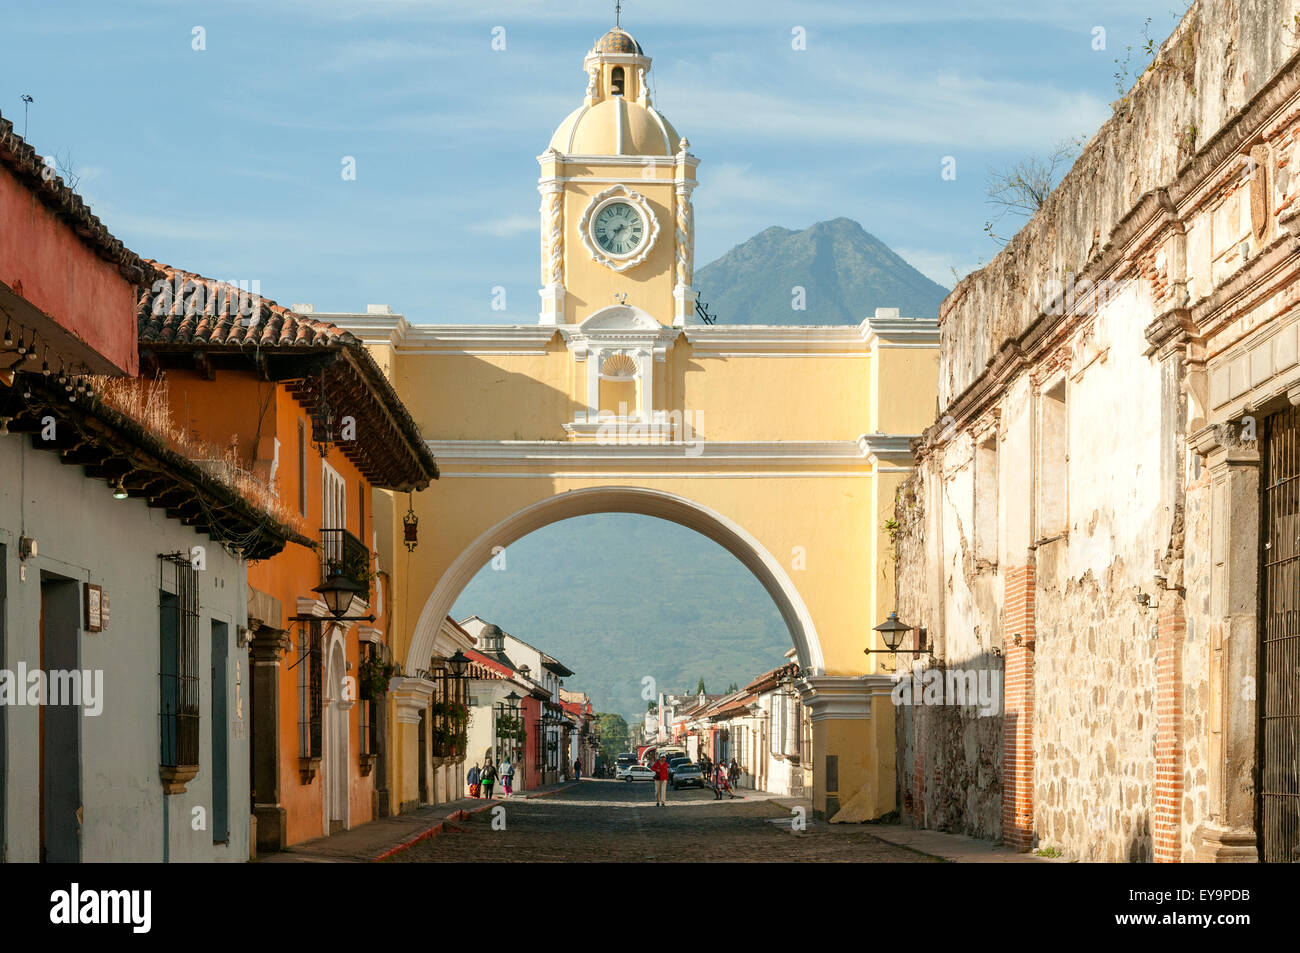 Santa Catalina Arch, Antigua, Guatemala - Stock Image